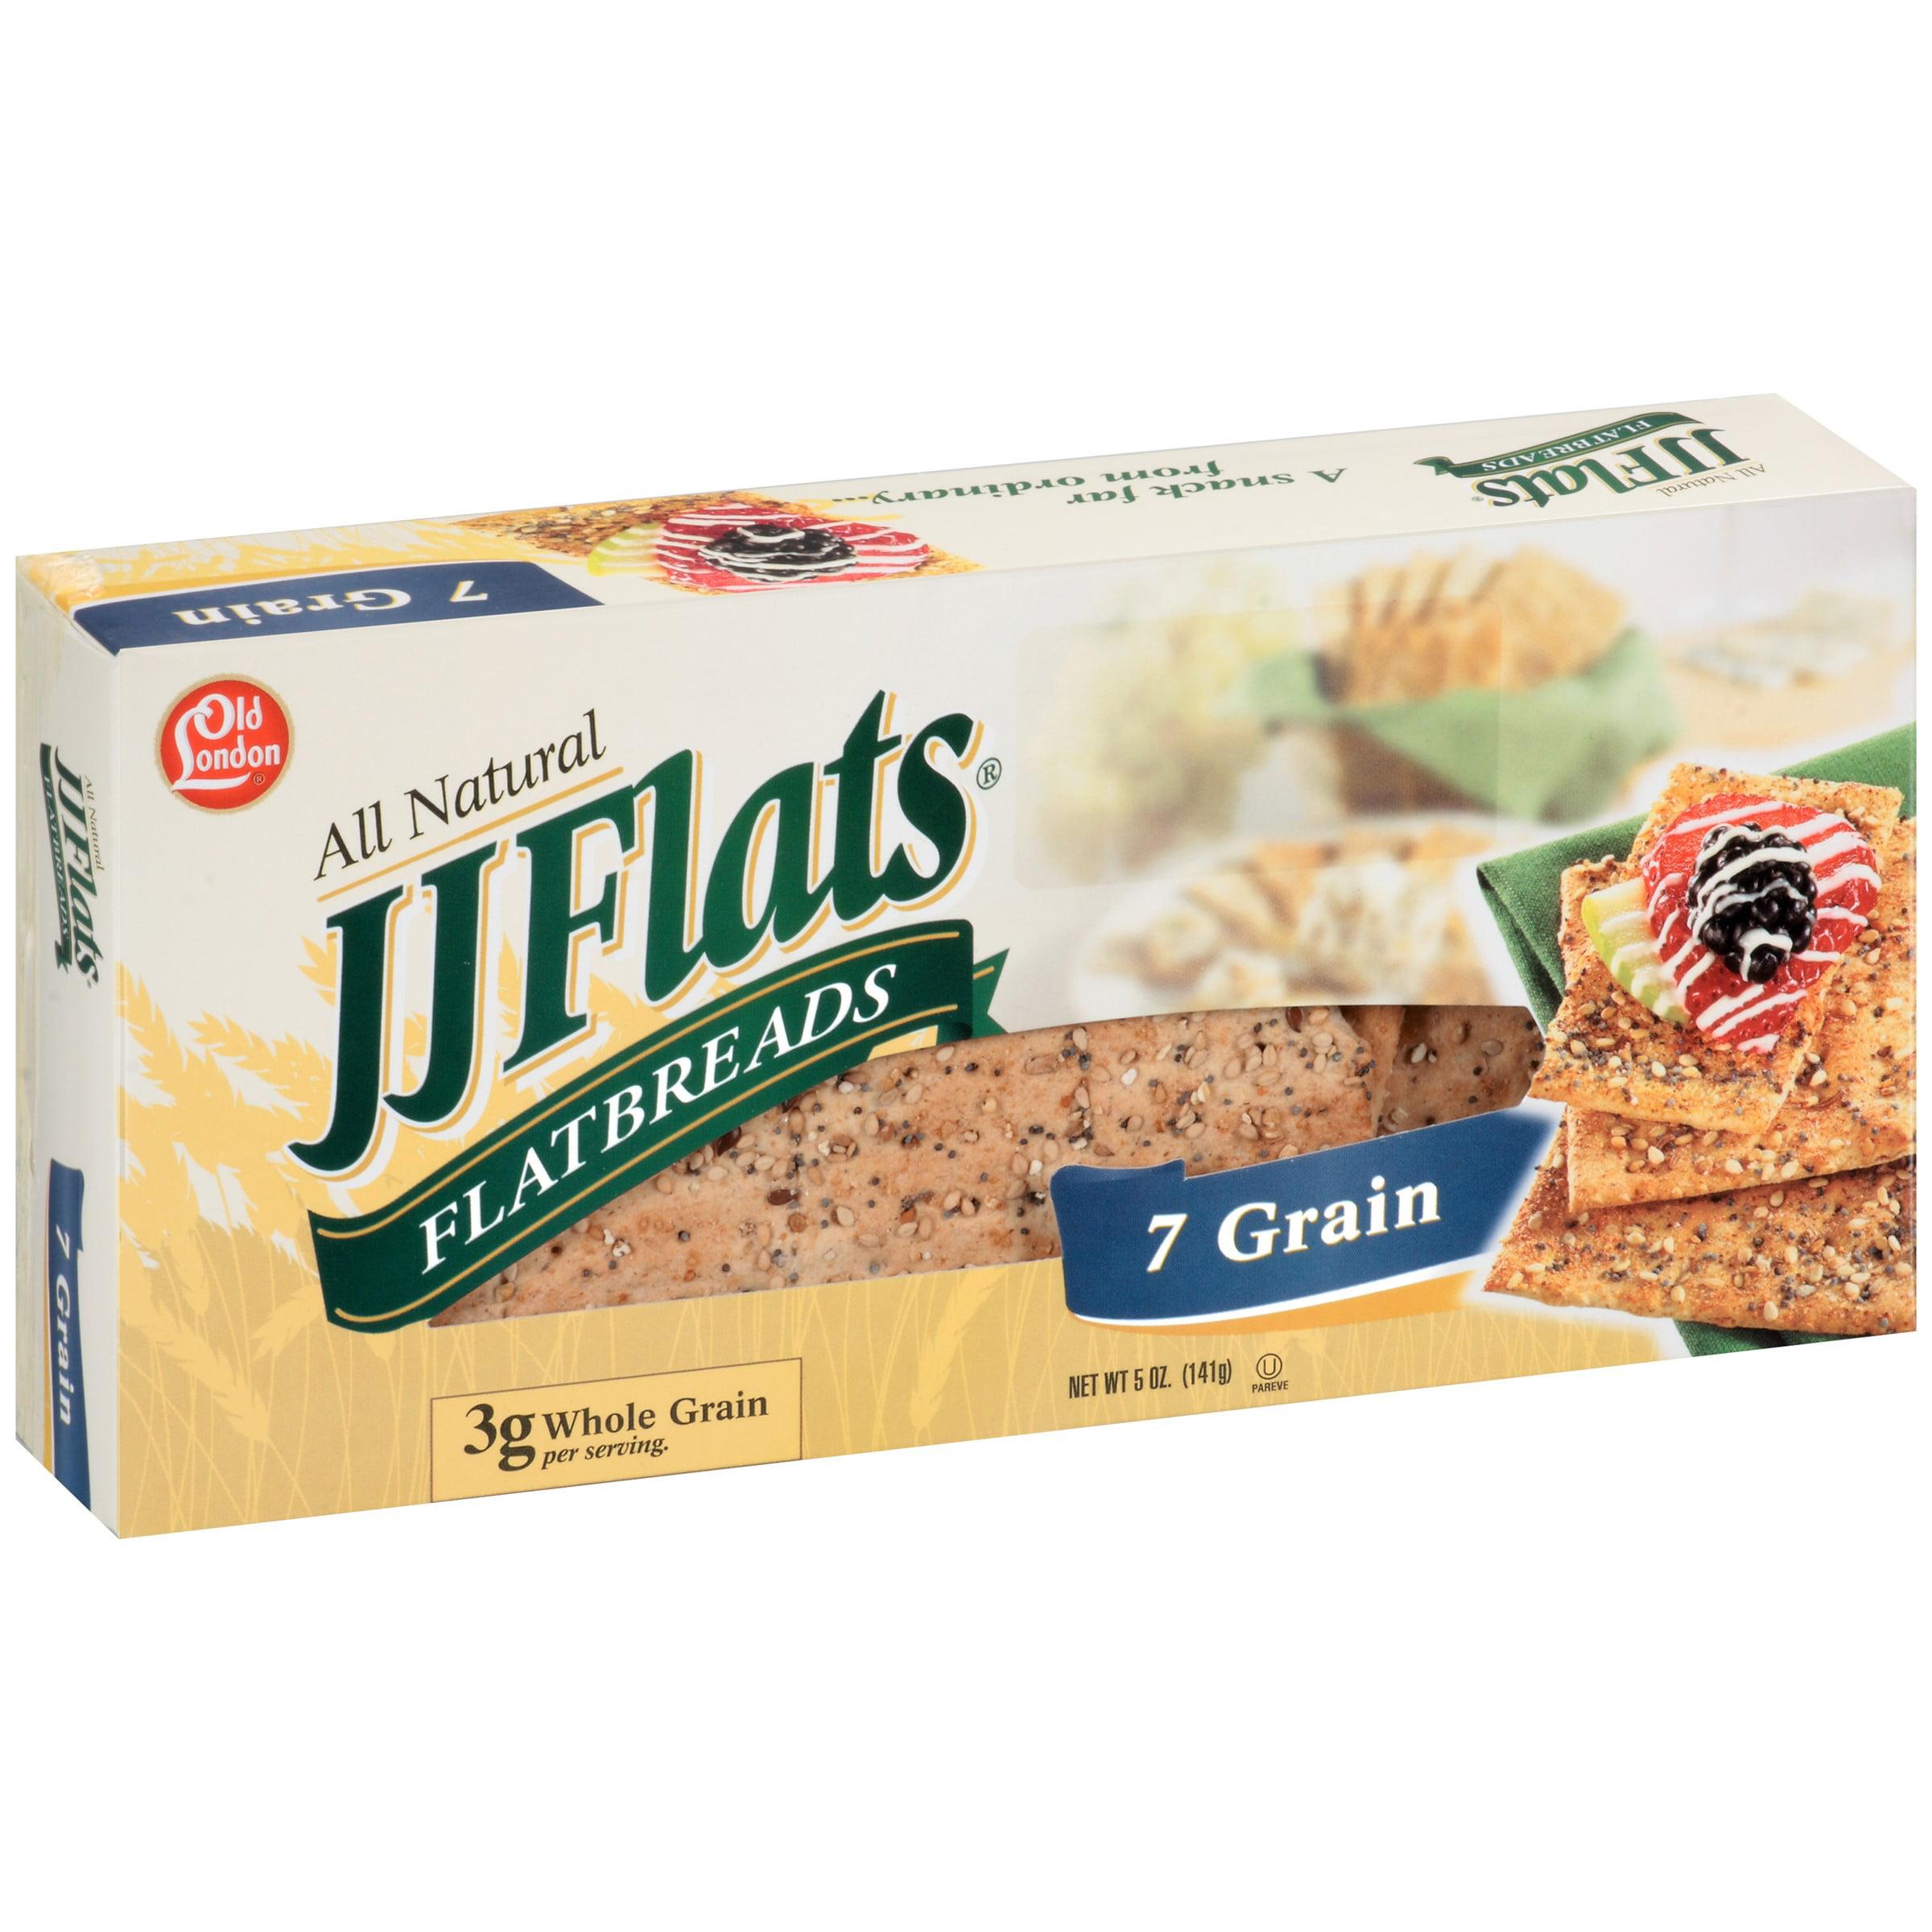 Old London Foods Flats Flatbread, 7 Grain, 5 Oz